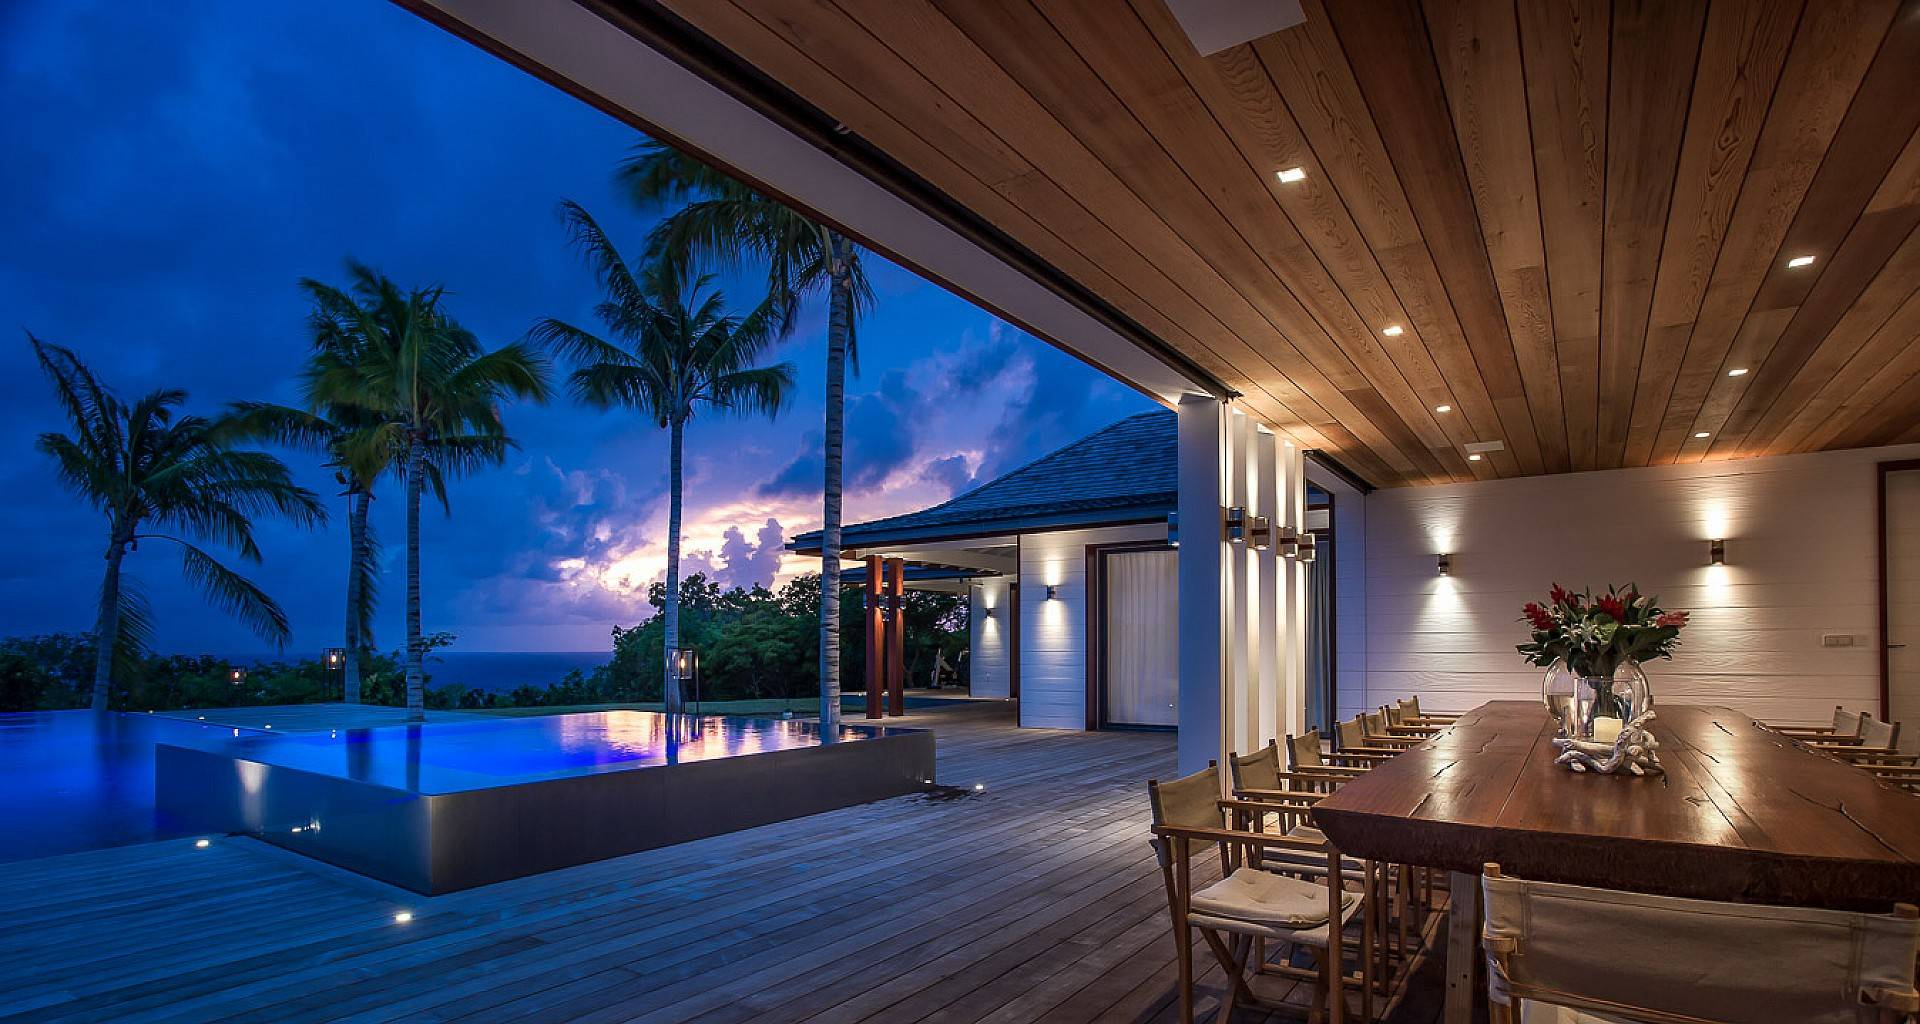 Villa Maison Blanc Bleu Outside